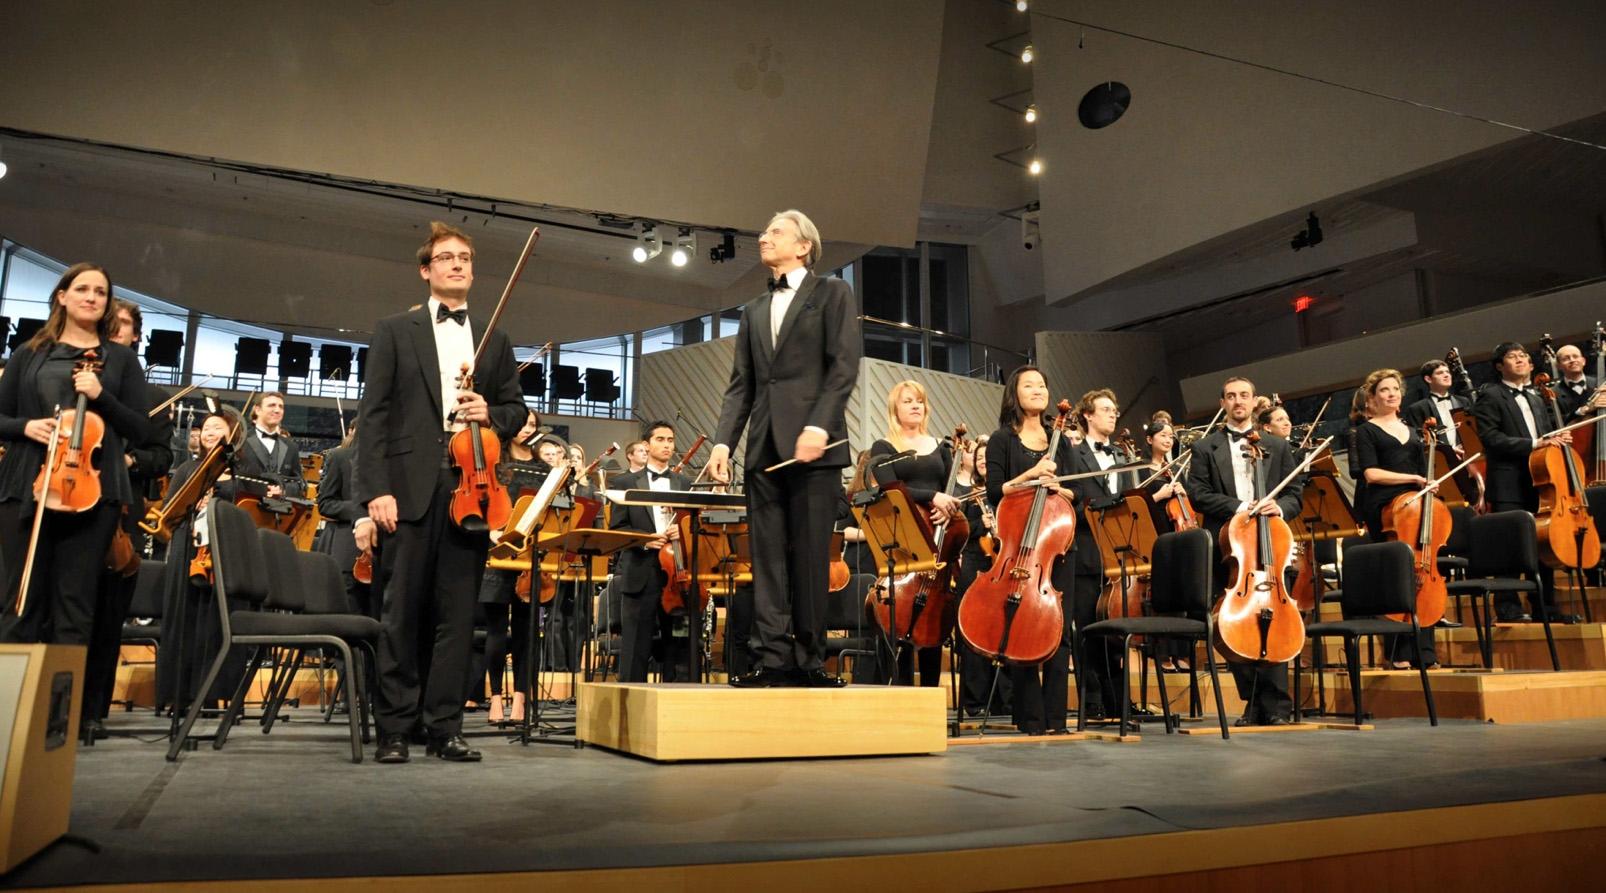 10_Michael Tilson Thomas + The New World Symohony Orchestra